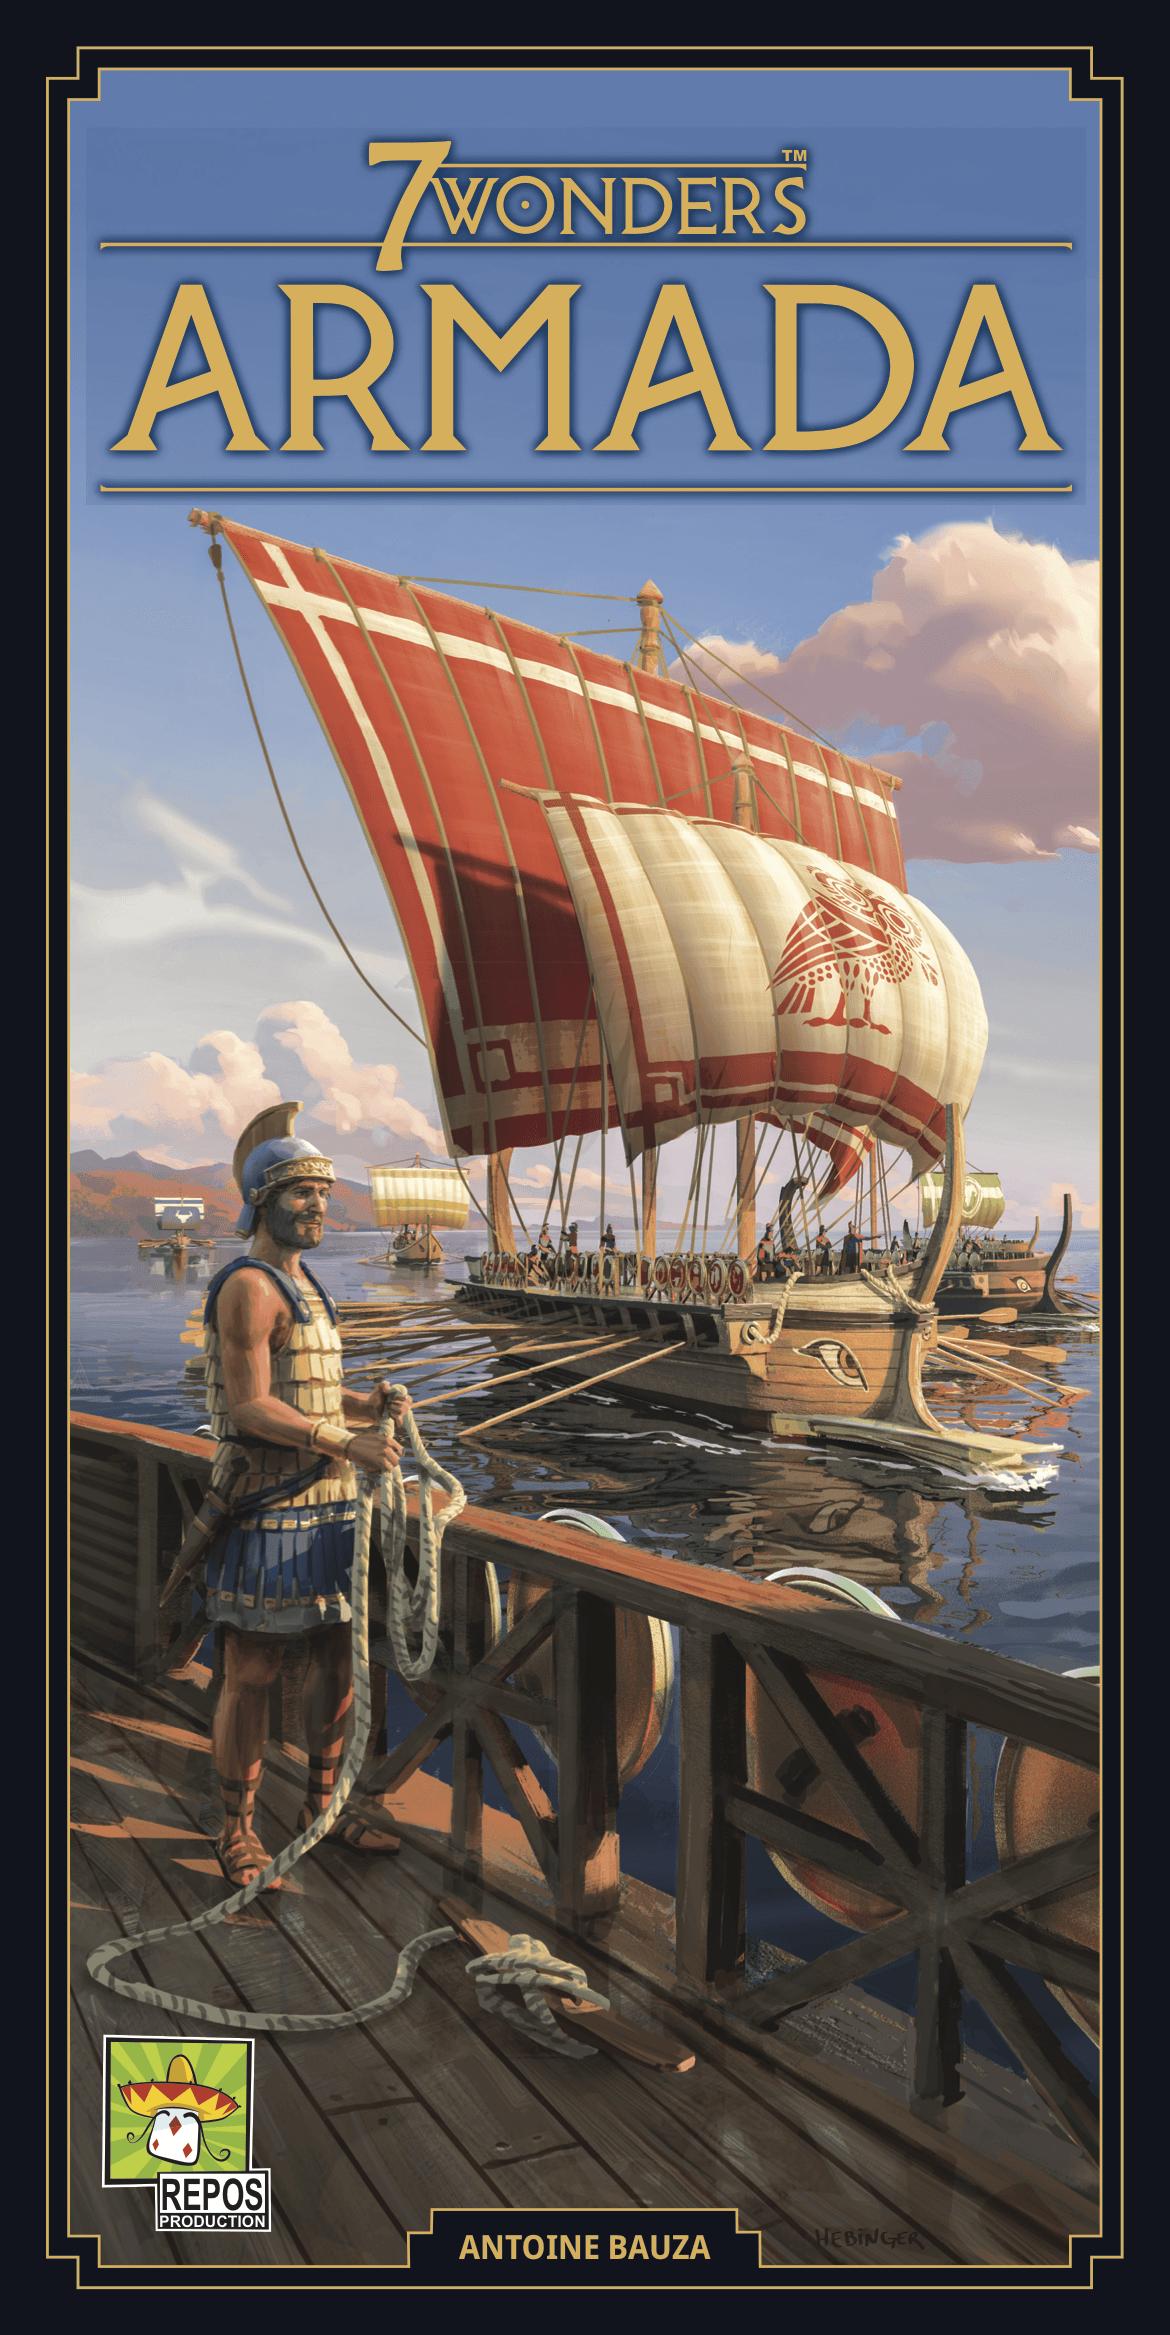 7 Wonders 2nd Edition - Armada